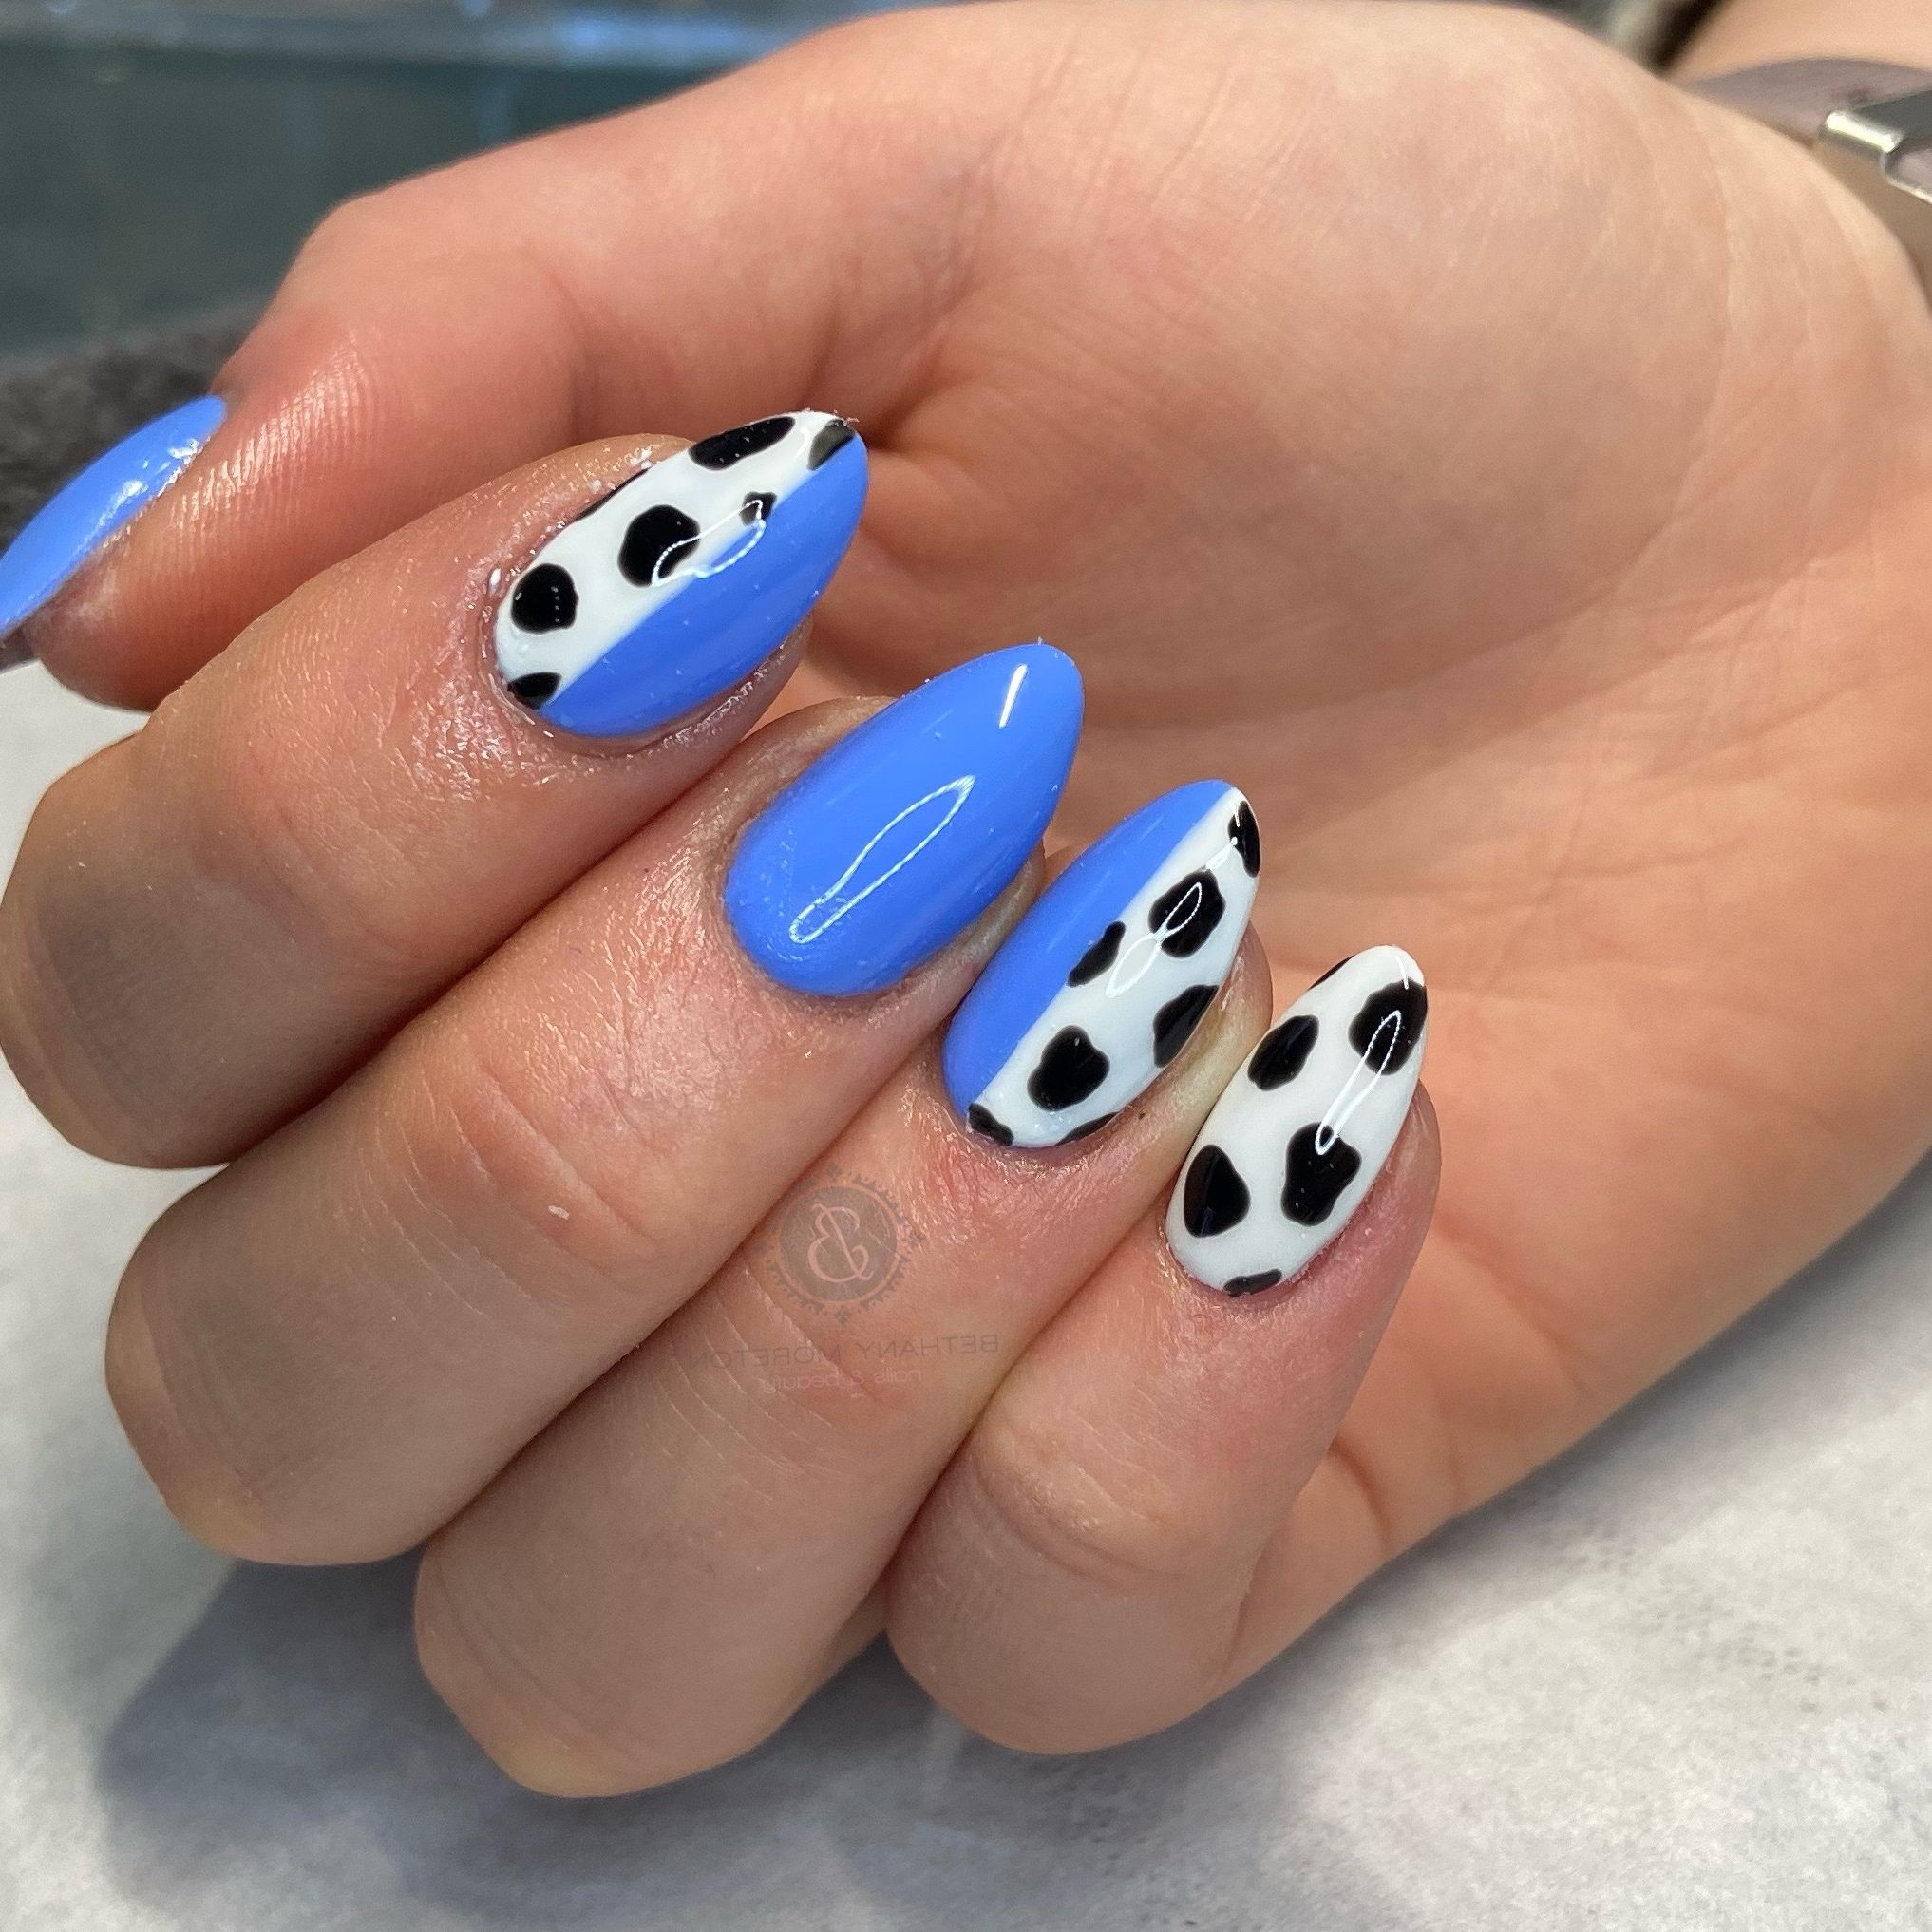 #nails #thegelbottle #biab #nailtech #nailsbybeff #Staffordshire #biddulph #cheshire #nailart #love #fashion #nailtechnician #scratchmagazine  #nailaddict #nailpro #showscratch #polish #nailfie #cowprintnails